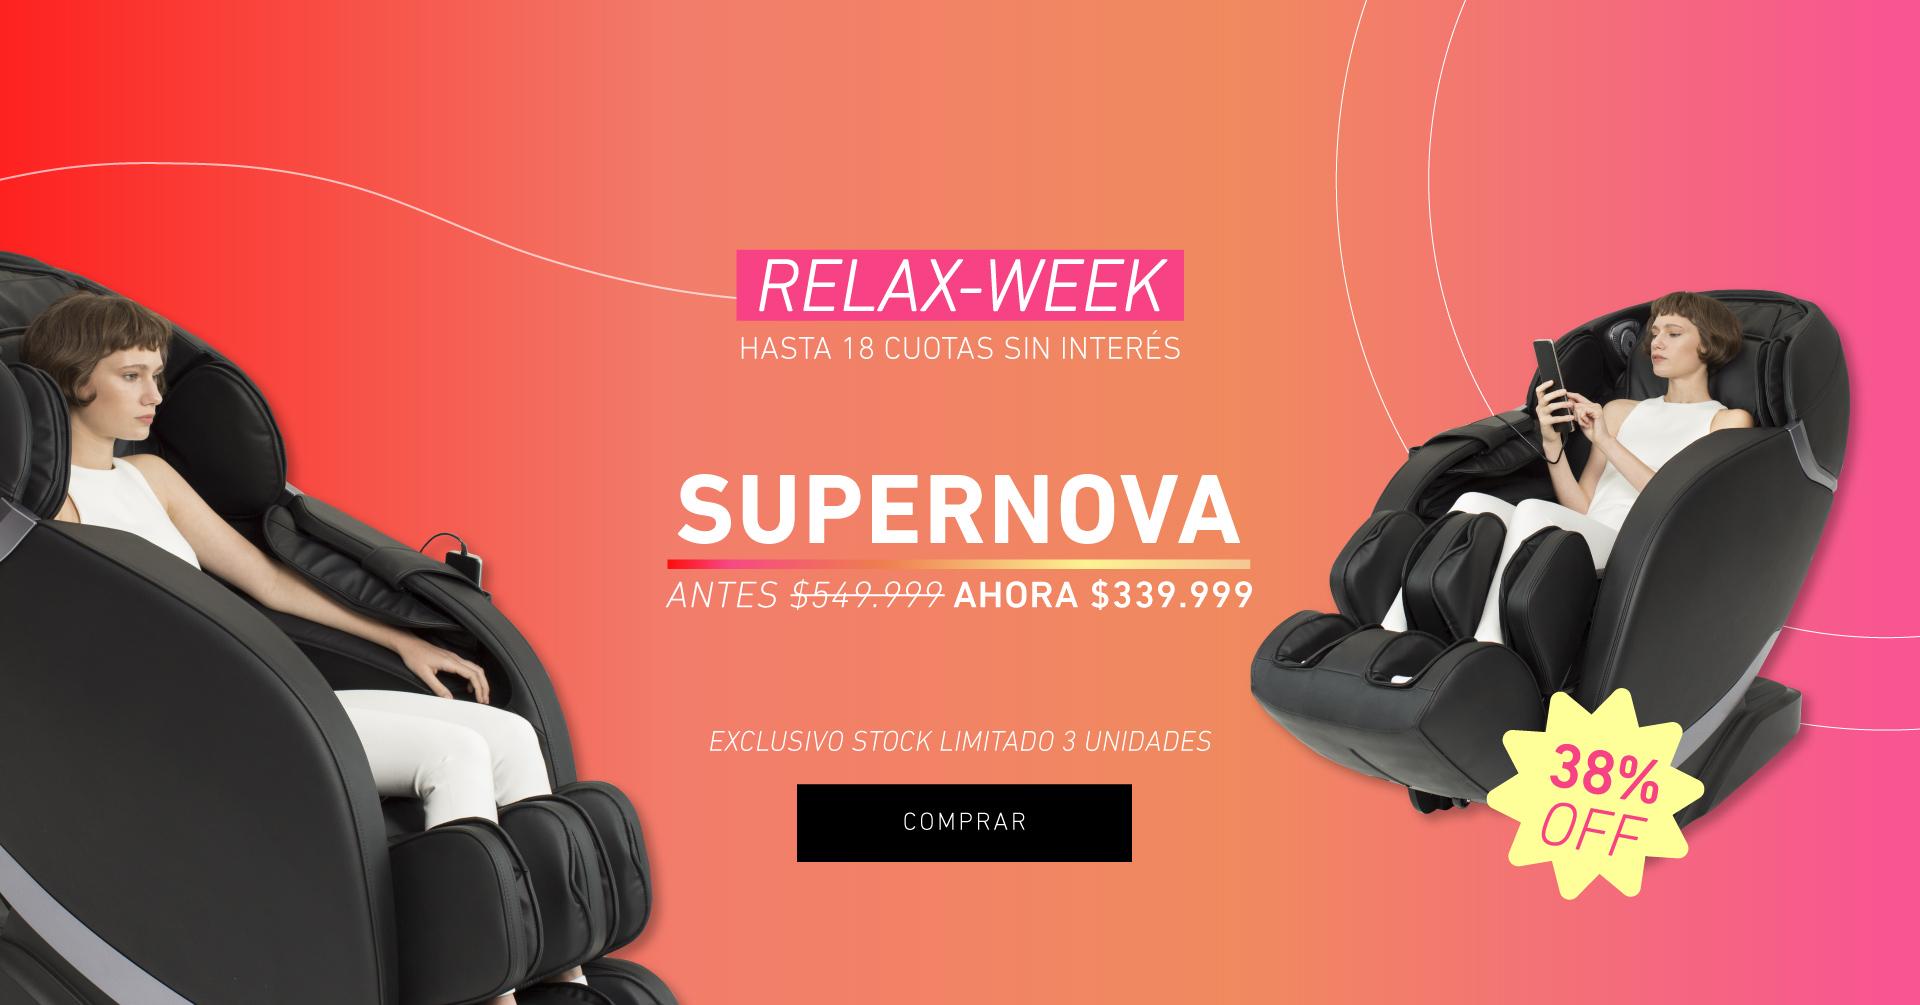 RelaxWeek Supernova